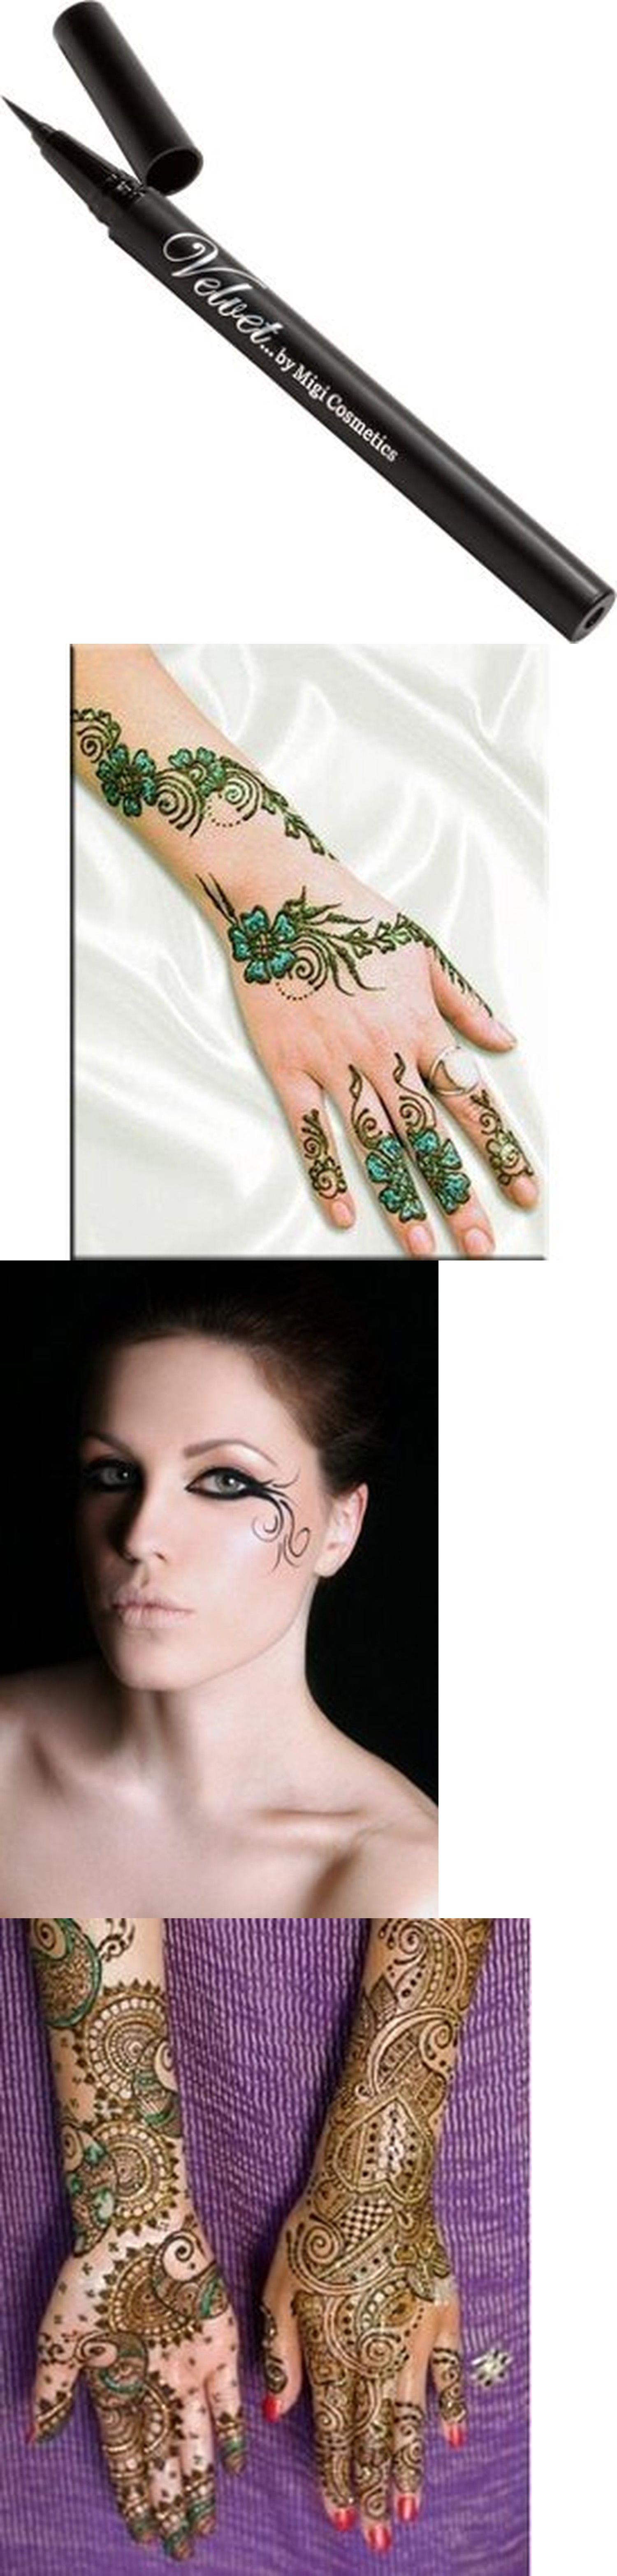 ... Tattoo Skin Pen eBay Source Generic Professional Body Art Tattoo Skin  Marker Marking Pens Set